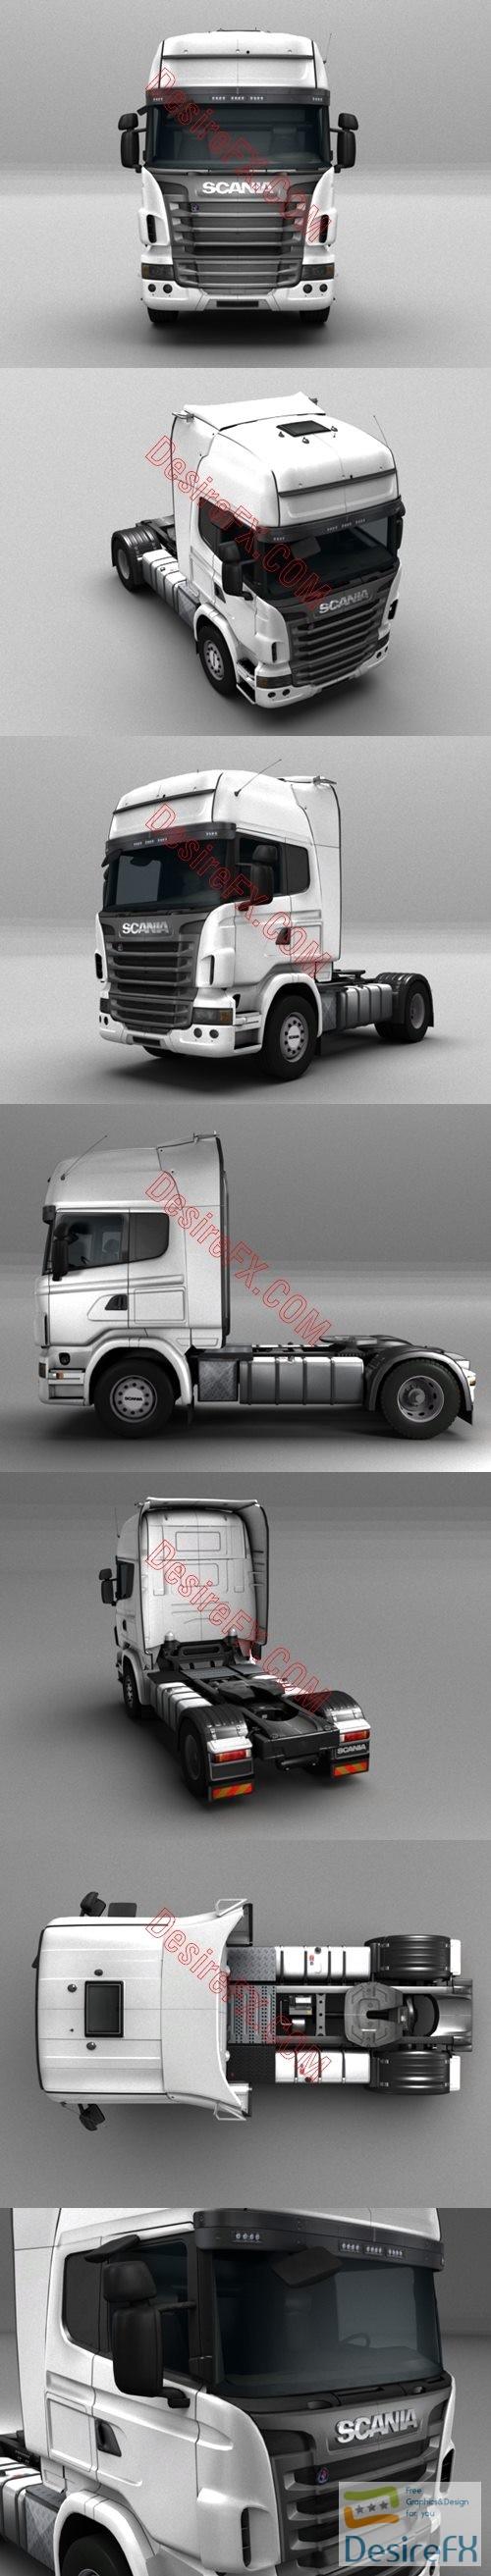 Scania truck R440 3D Model